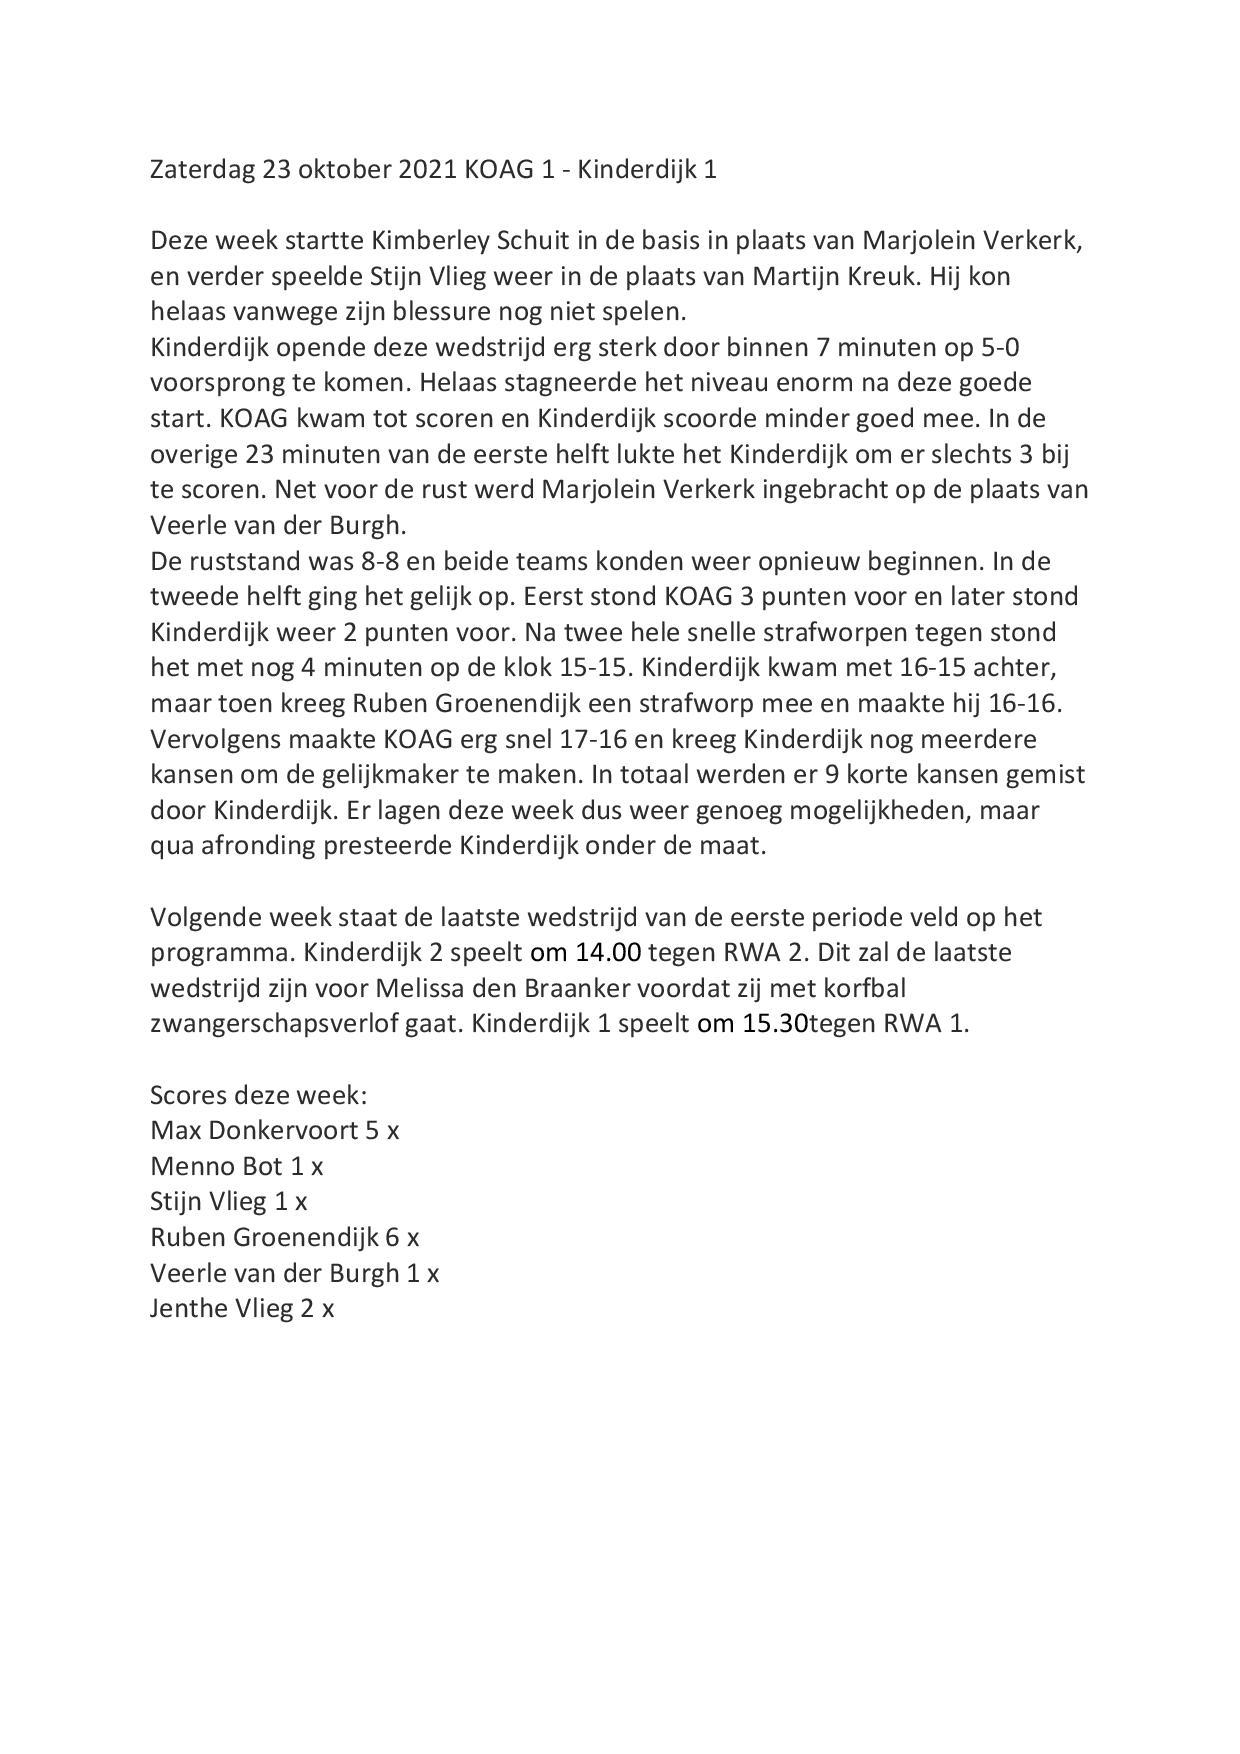 Wedstrijdverslag 23-10-2021 KOAG - Kinderdijk